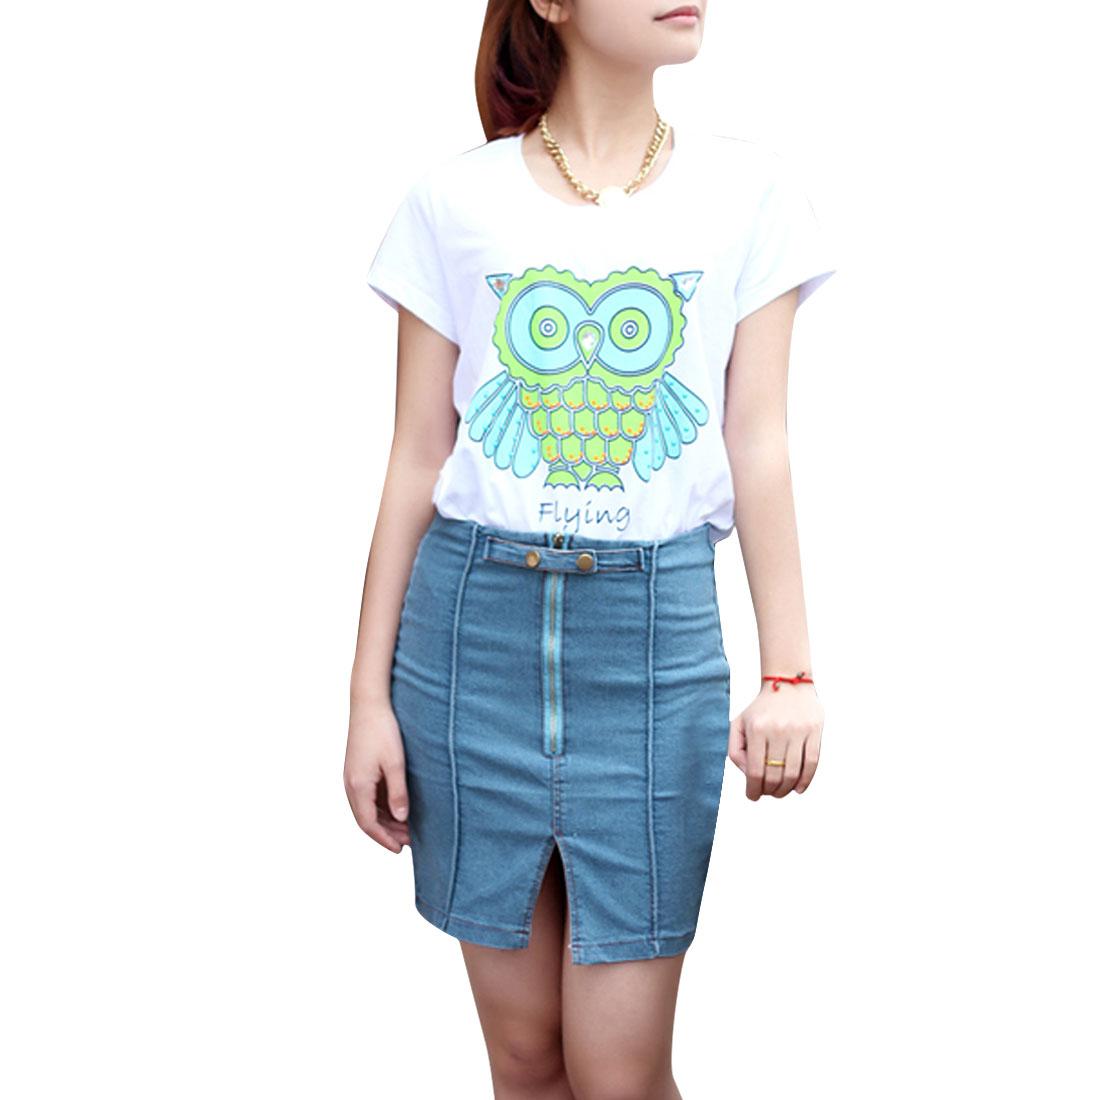 Women Zipper Closure Slim Fit Style Button Front Casual Skirt Light Blue XS